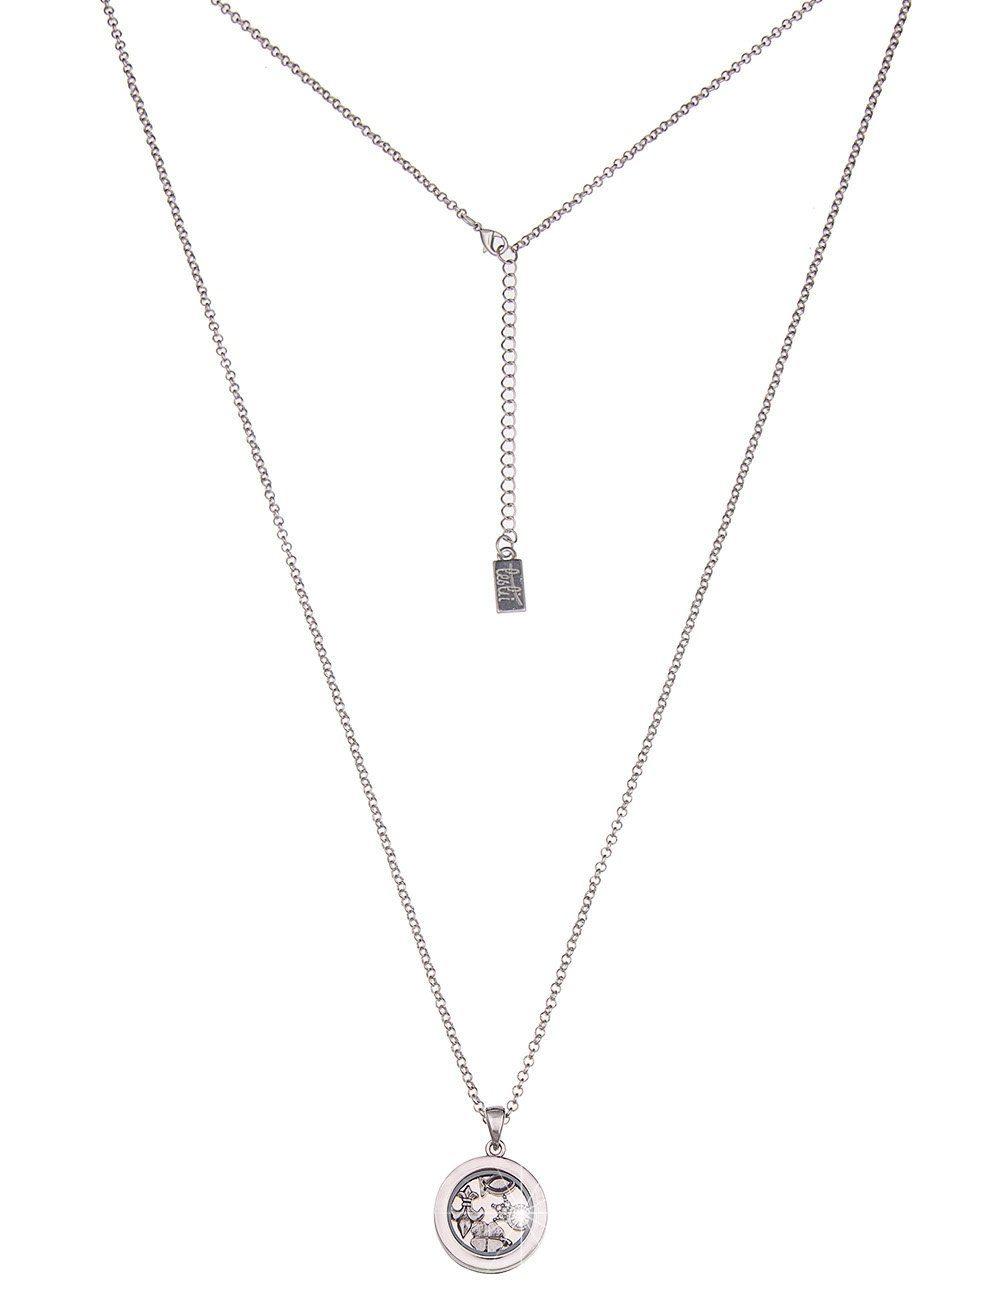 Leslii Halskette mit Medaillon